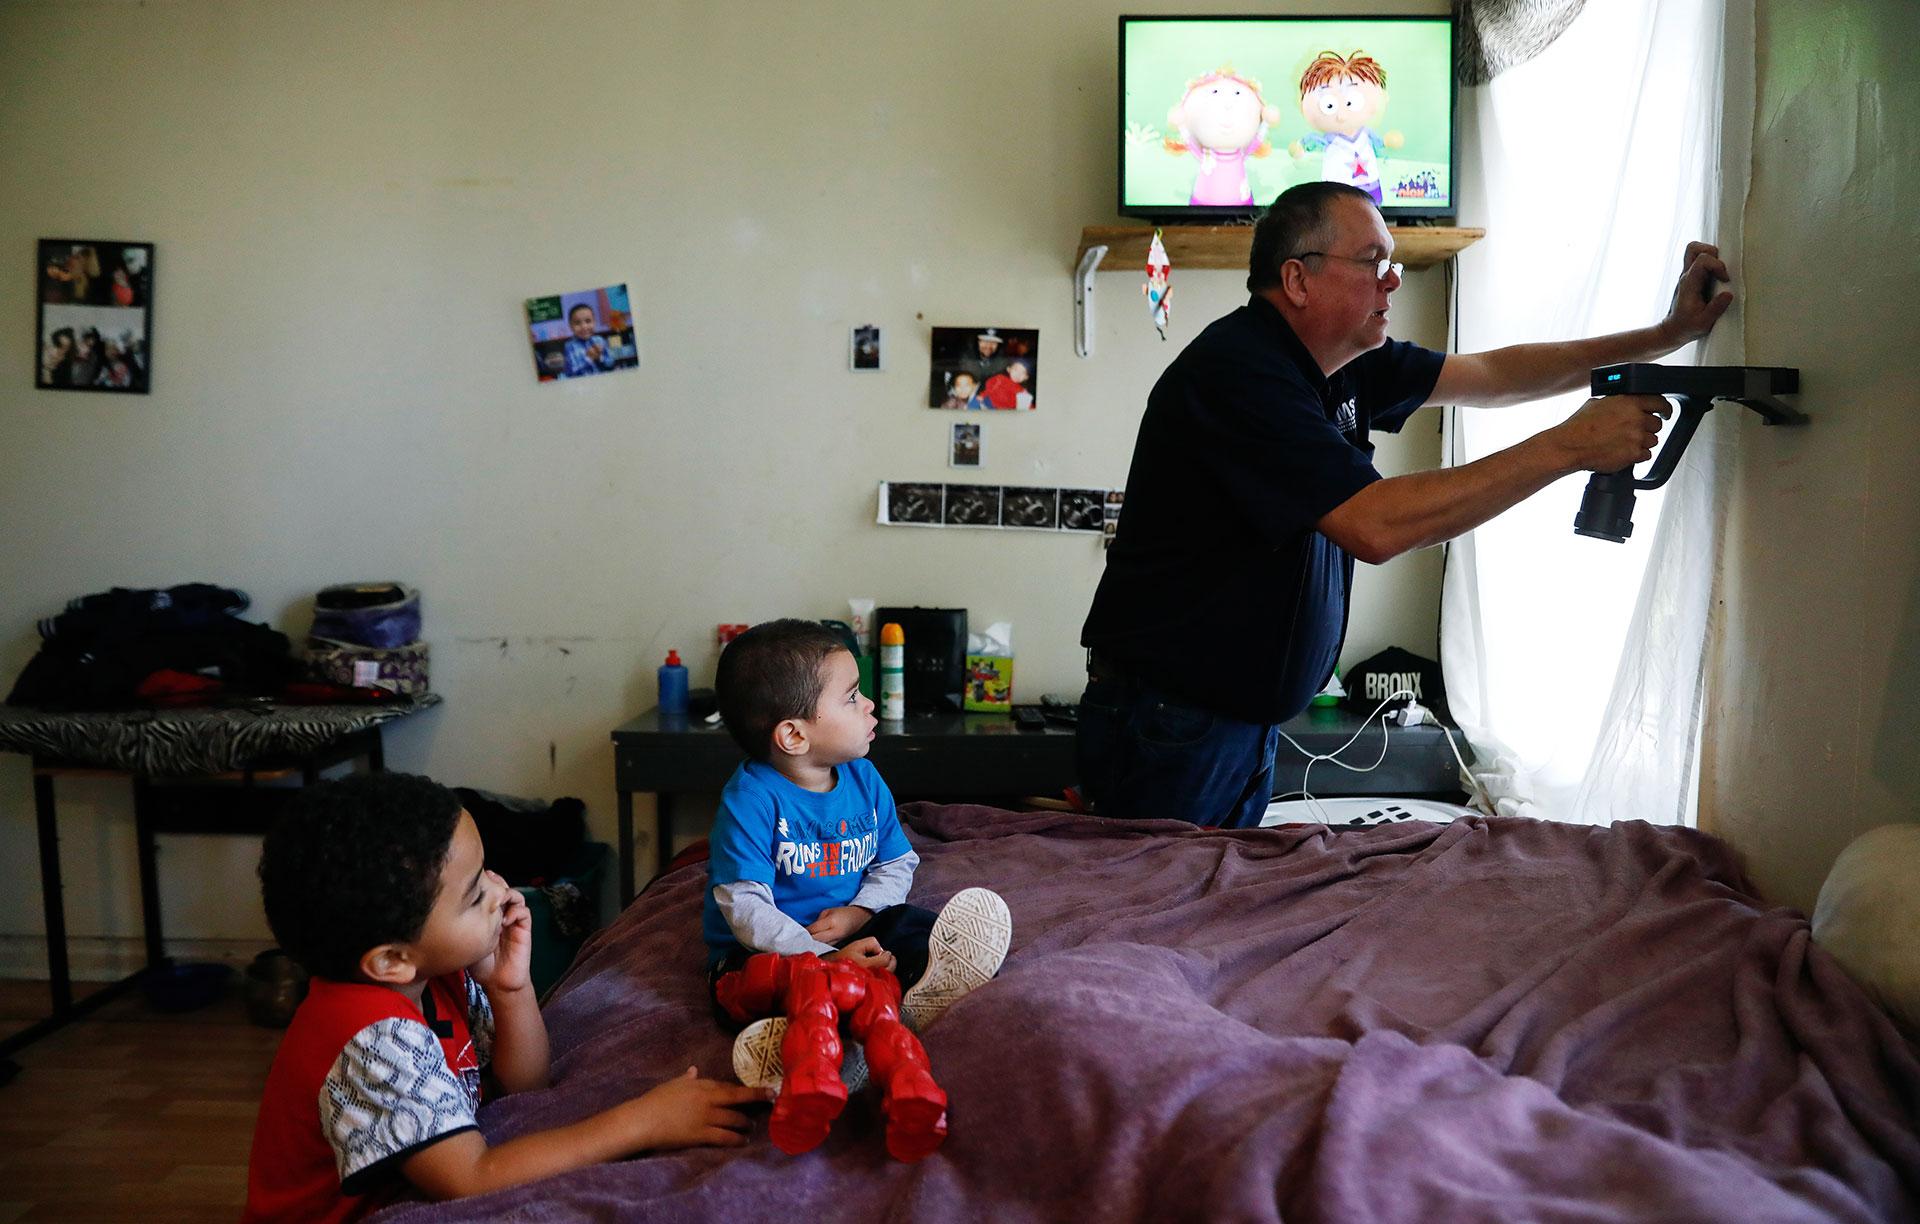 SPECIAL REPORT: Despite Progress, Lead Hazards Vex New York